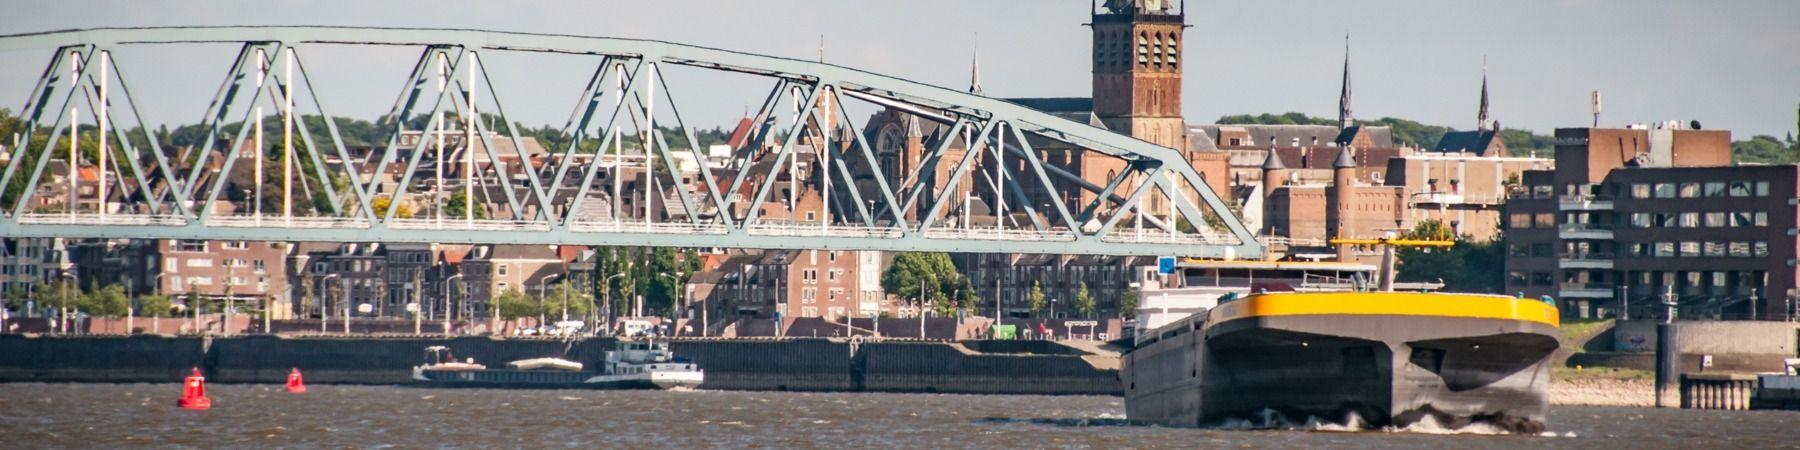 Autena Nijmegen